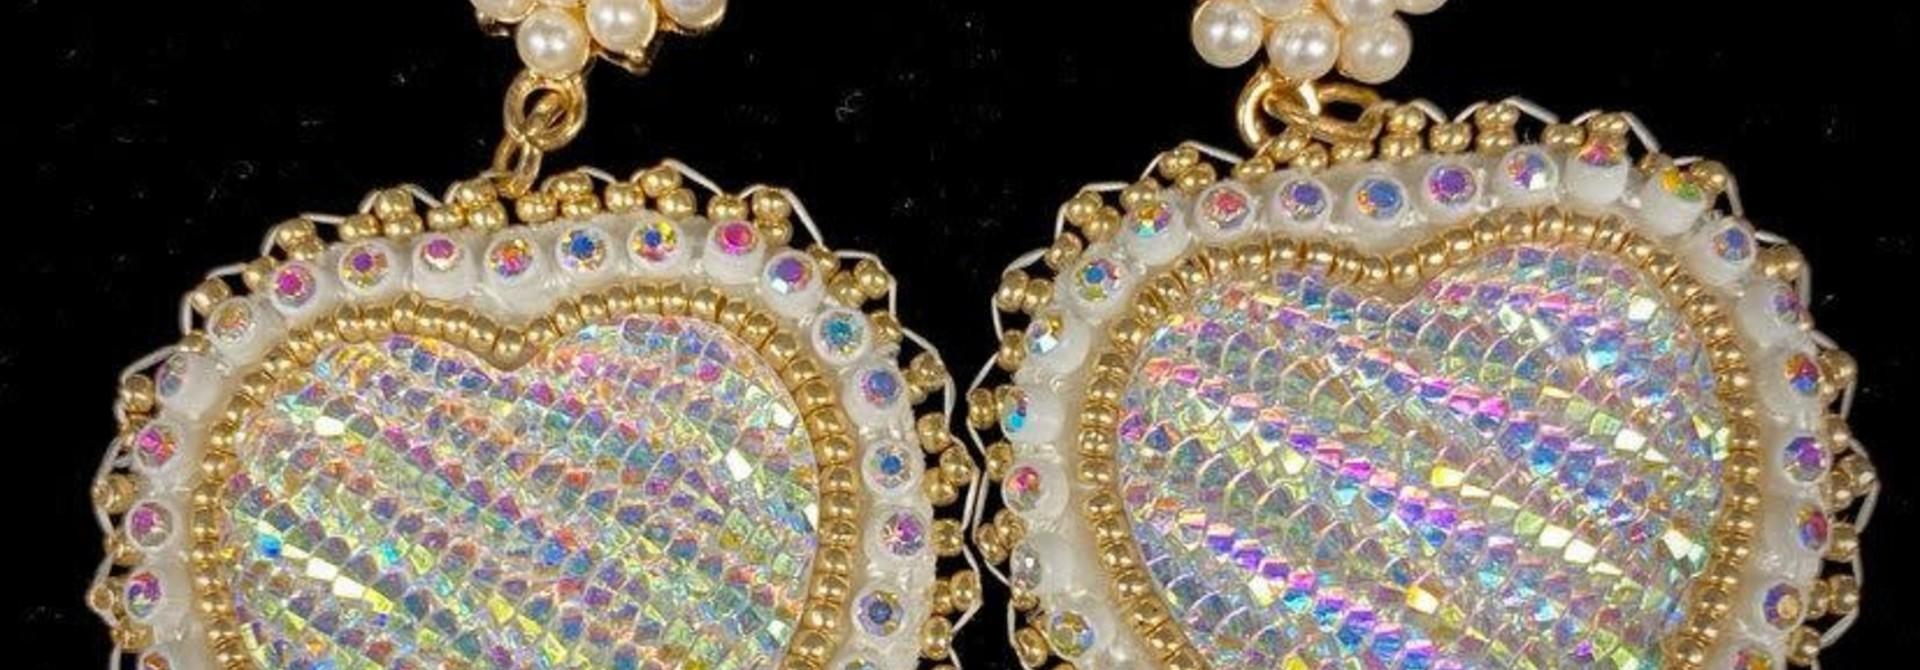 Hand Beaded Heart & Pearl Earrings by Shawnee Renee